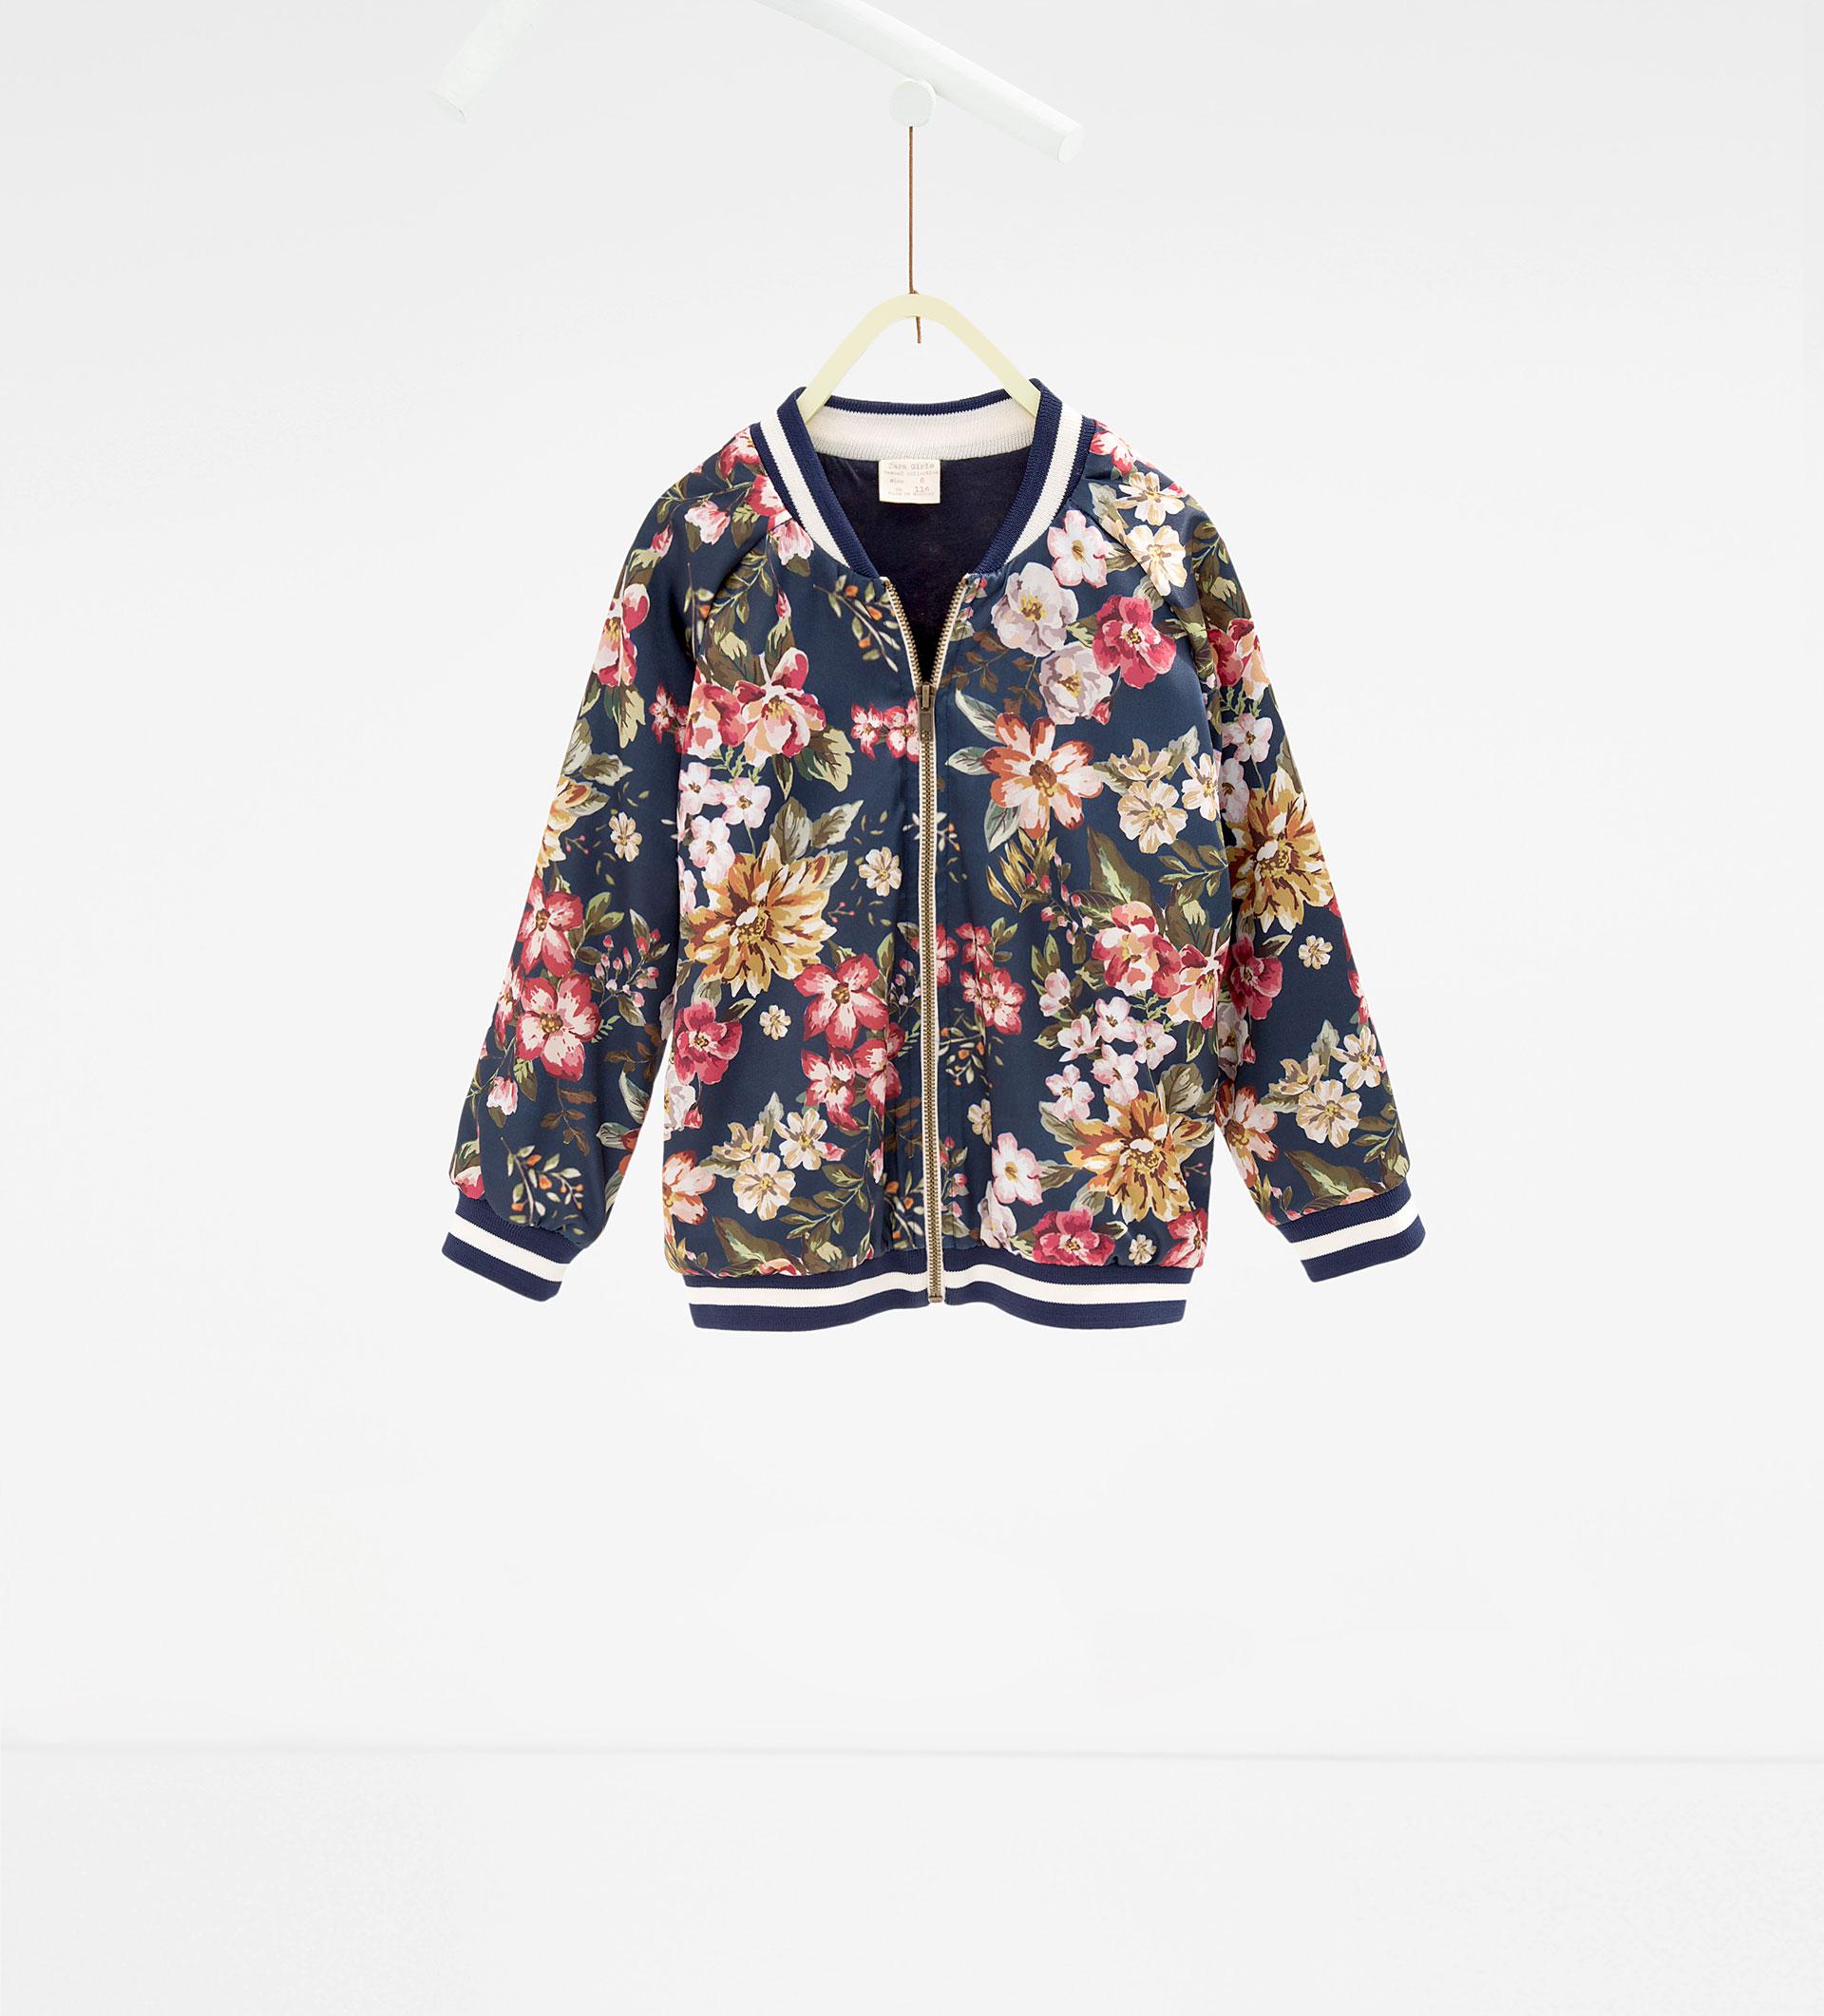 Zara Floral Bomber Jacket